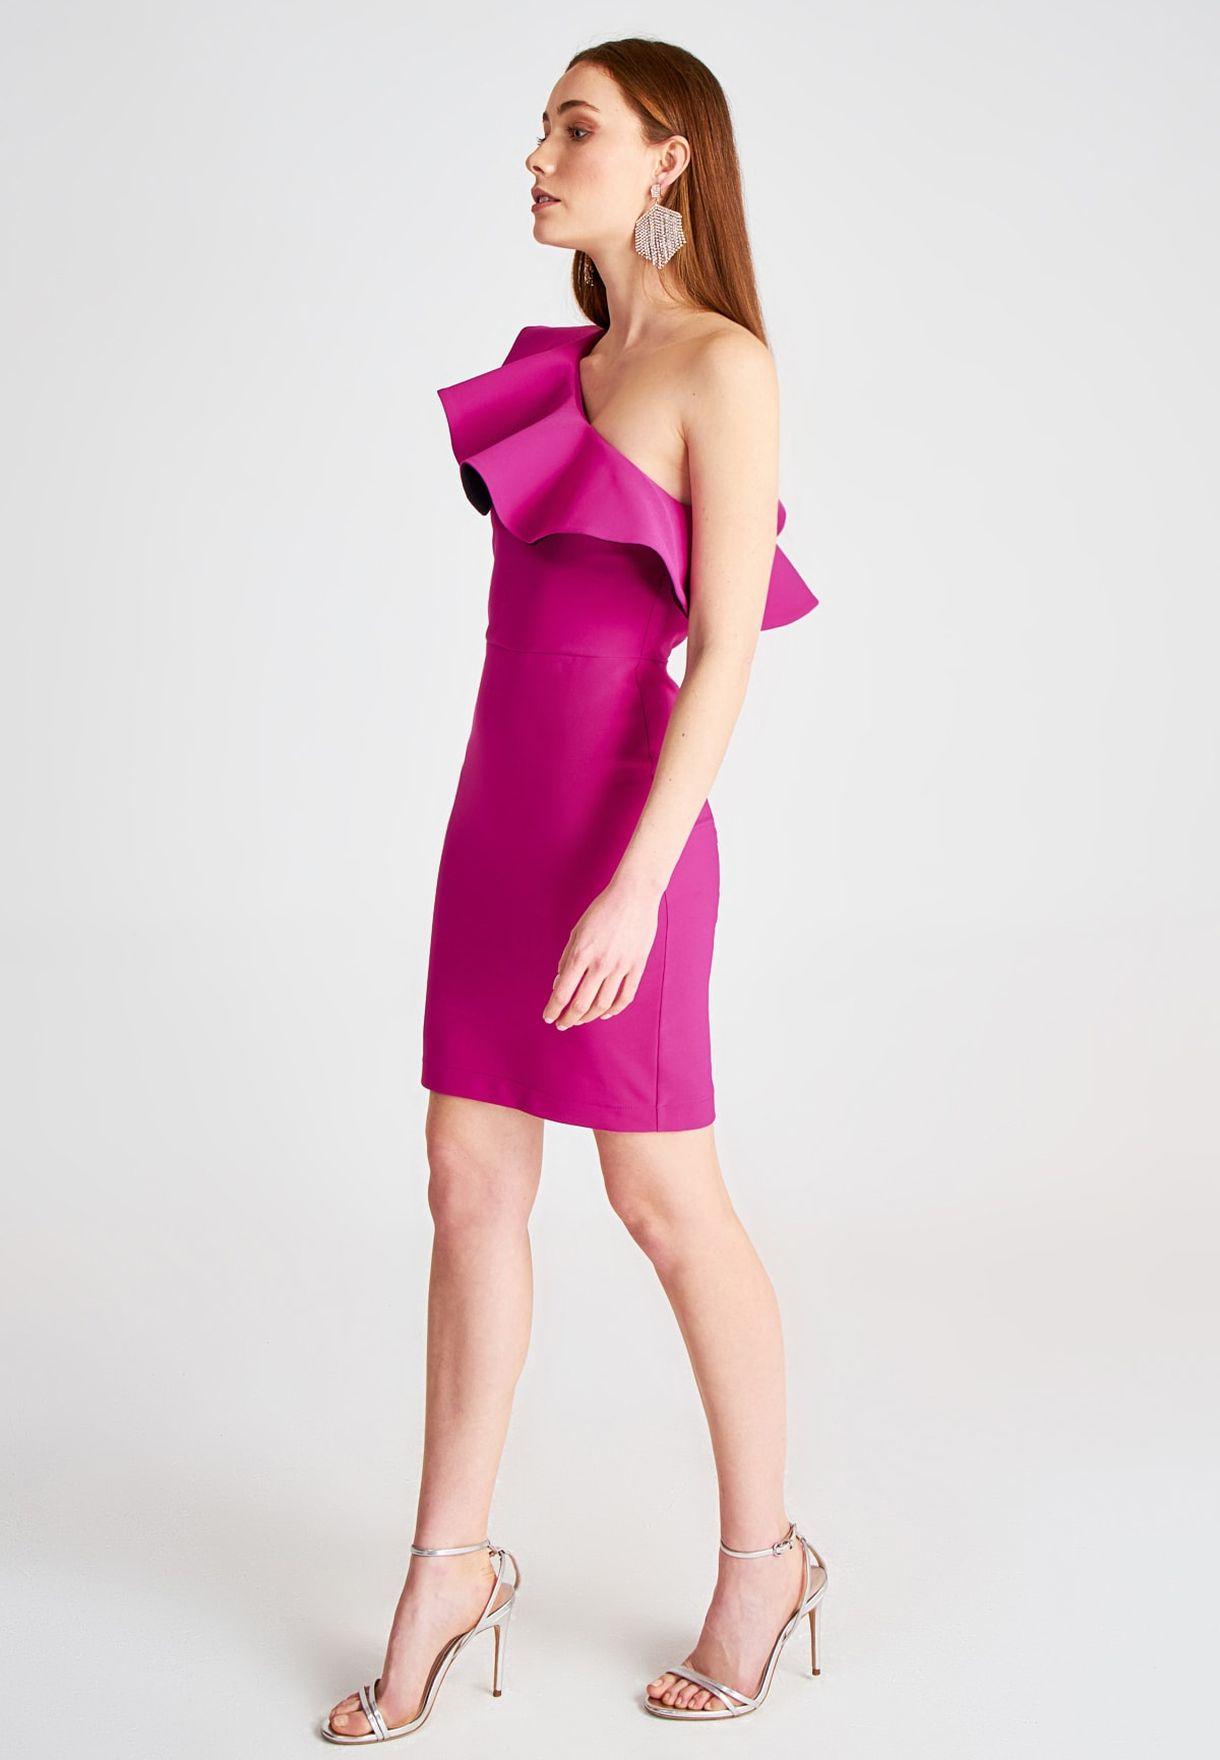 Buy Trendyol Pink Ruffle Trim Bodycon Dress For Women, Uae 27680atgngdp